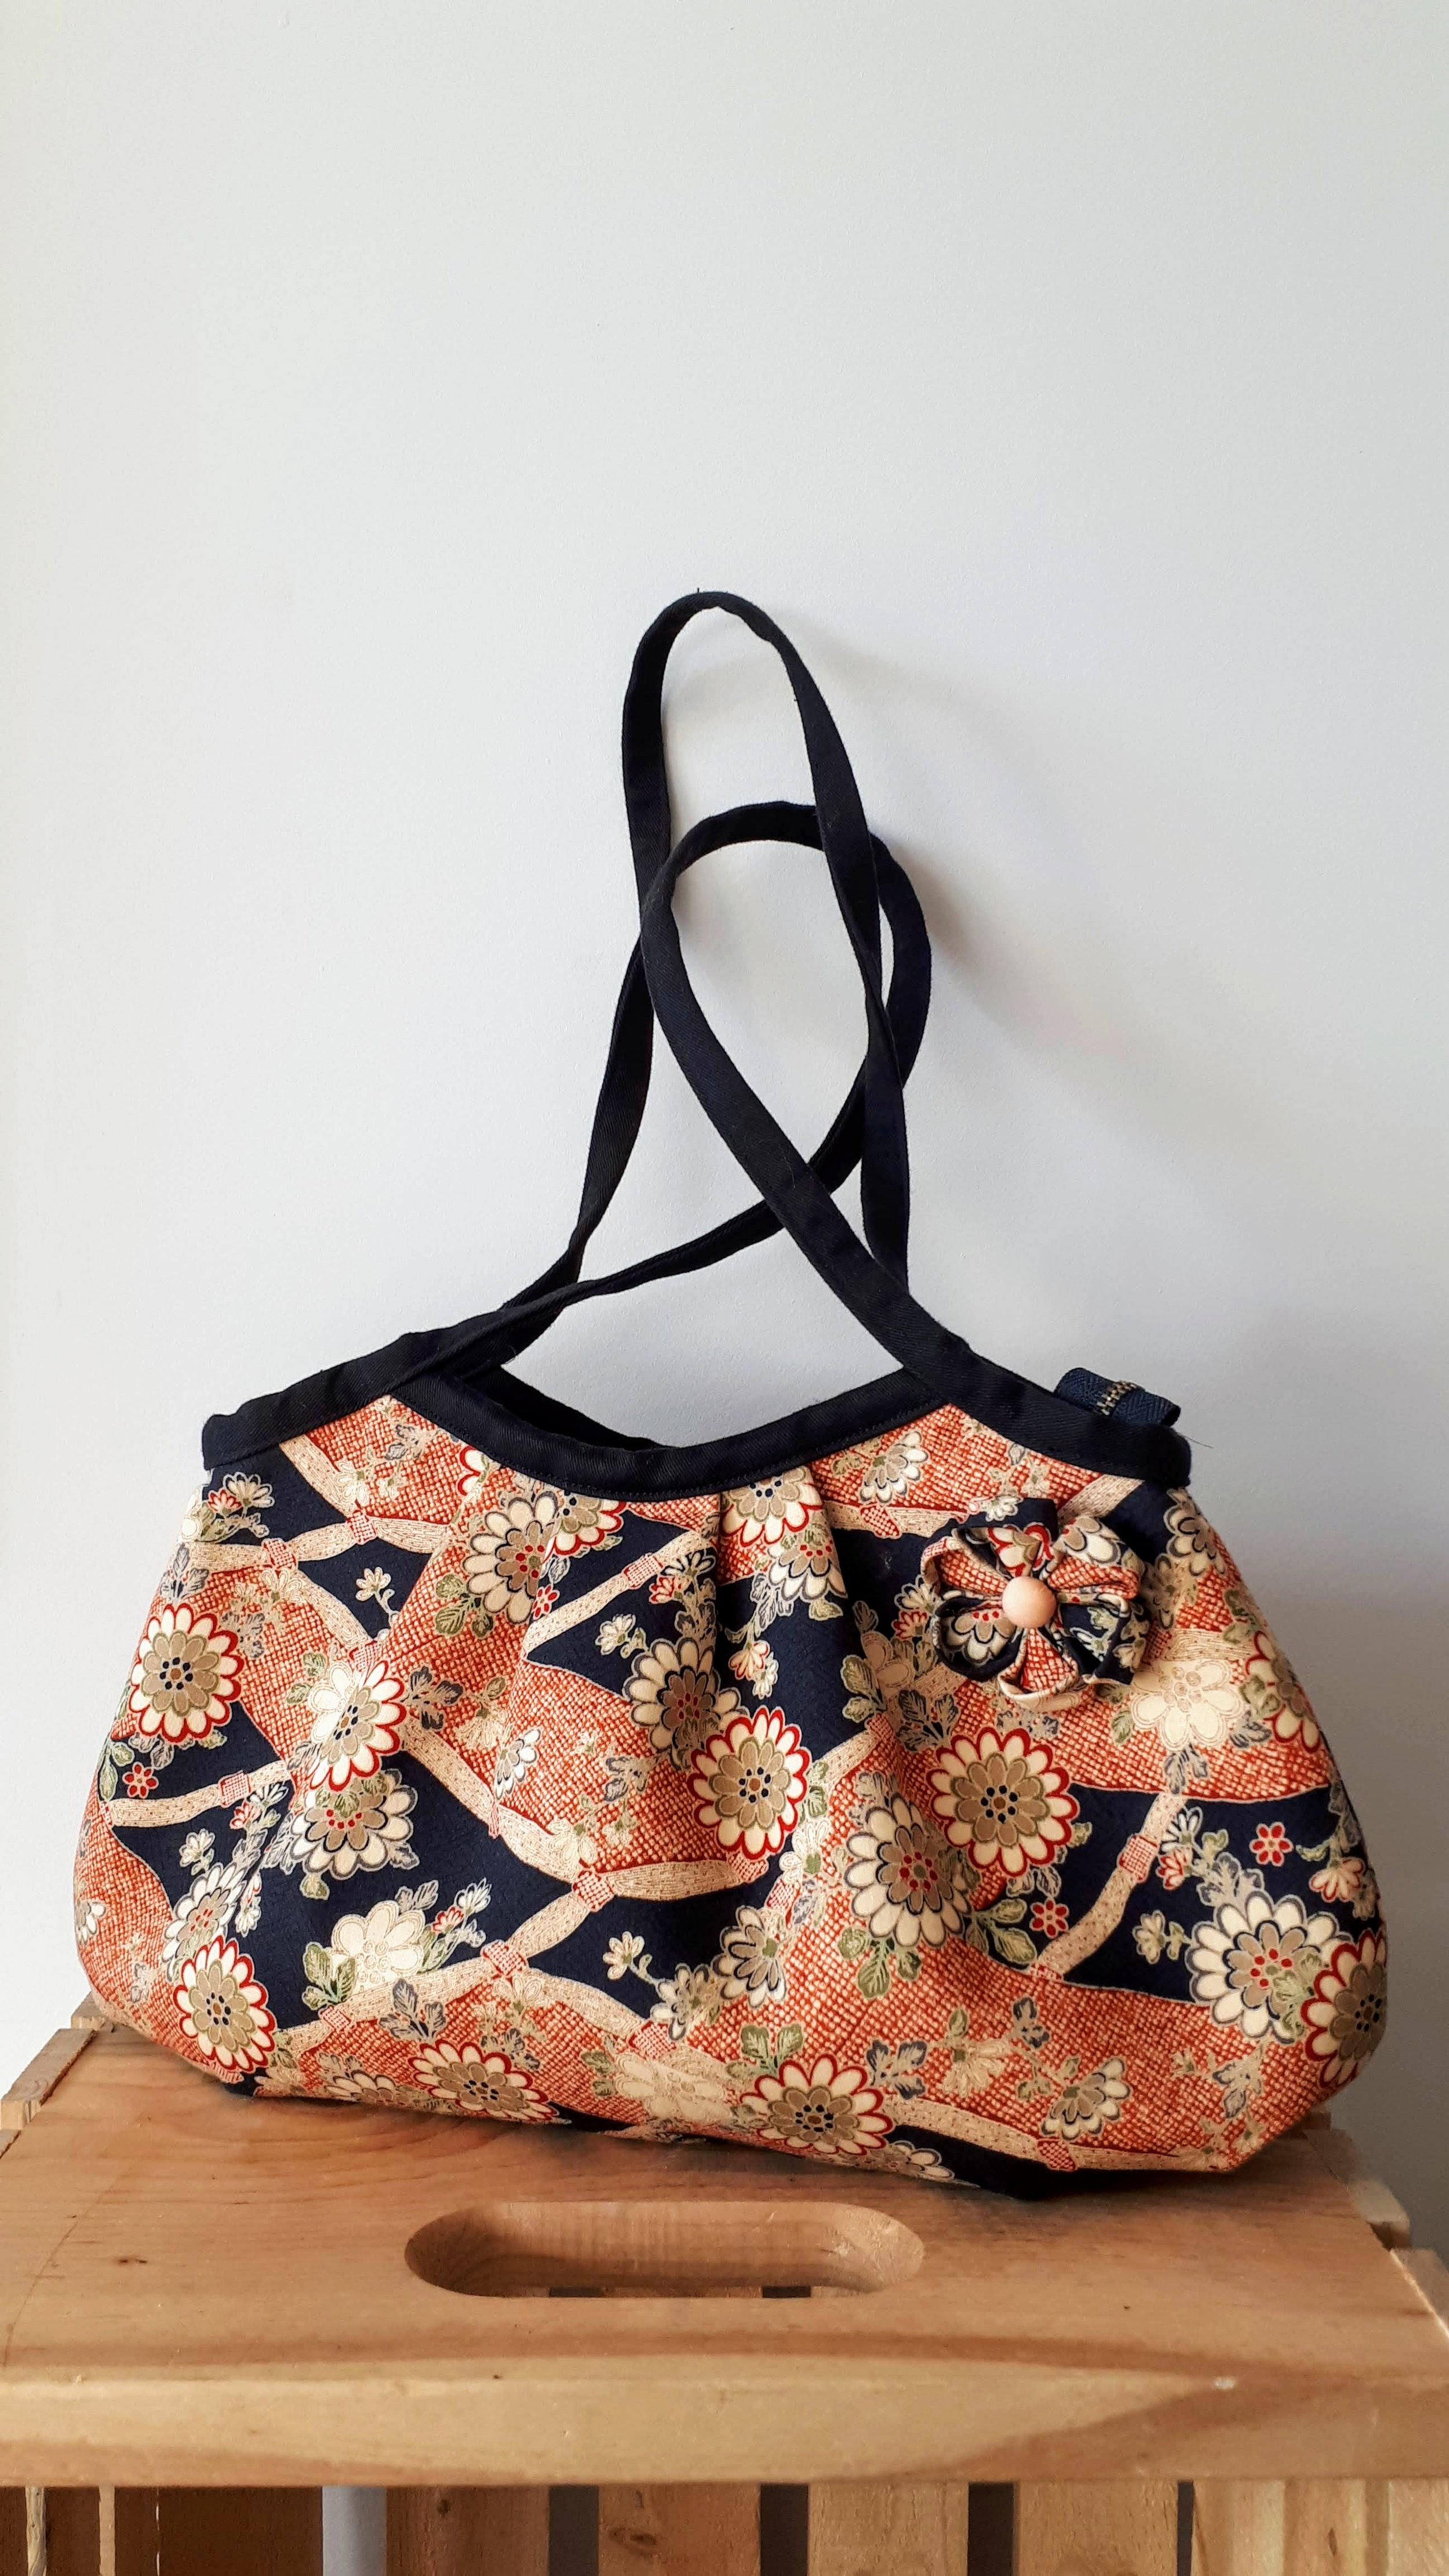 Yoga Bee Vintage purse, $24